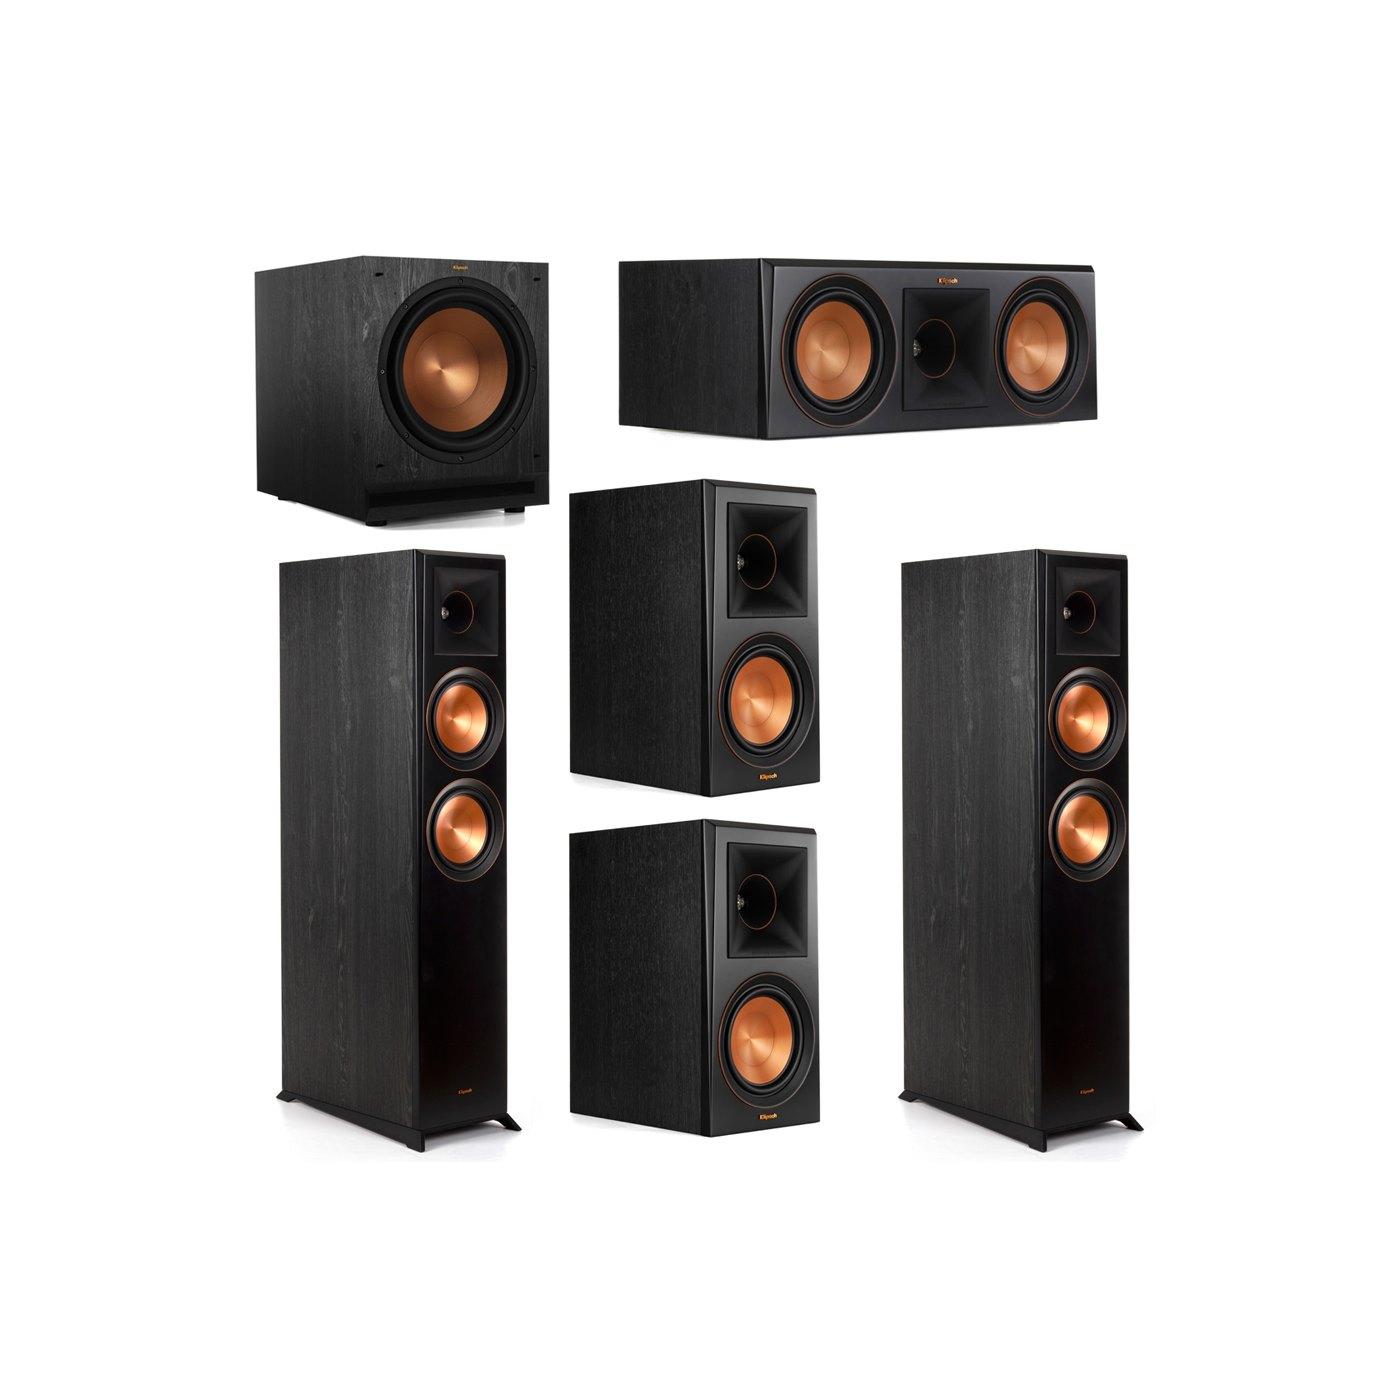 Klipsch 5.1 System with 2 RP-6000F Floorstanding Speakers, 1 Klipsch RP-600C Center Speaker, 2 Klipsch RP-600M Surround Speakers, 1 Klipsch SPL-120 Subwoofer